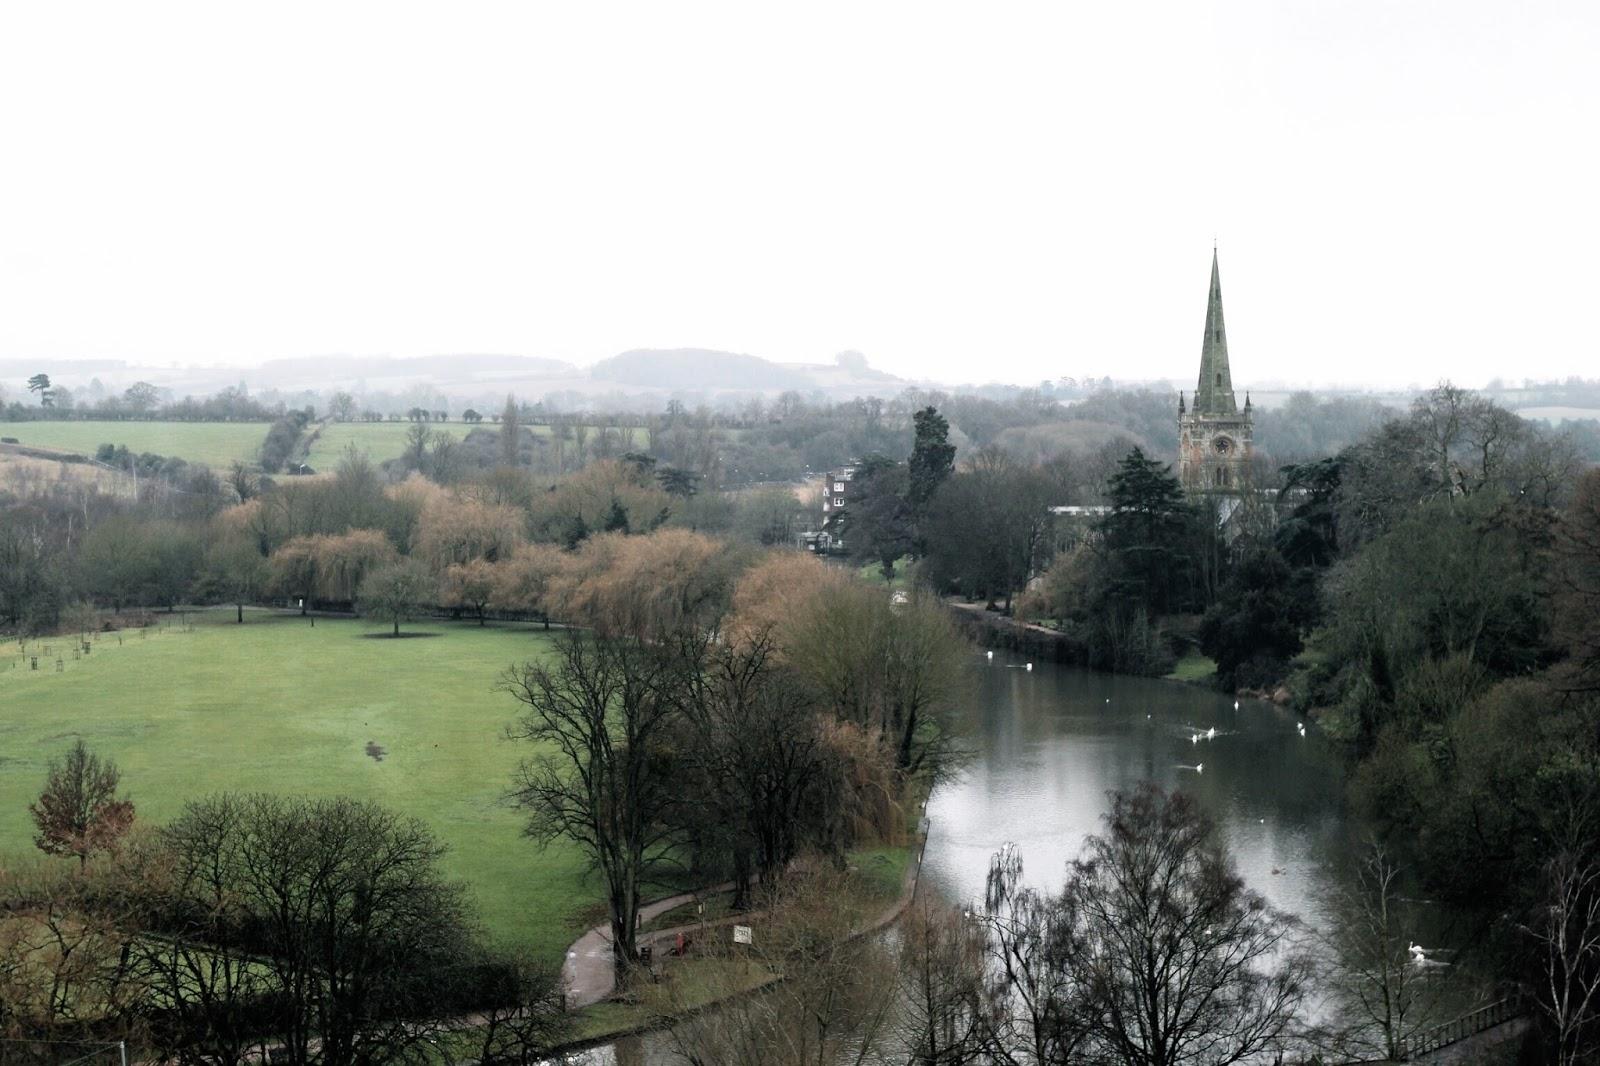 Landscape view of Stratford-upon-Avon